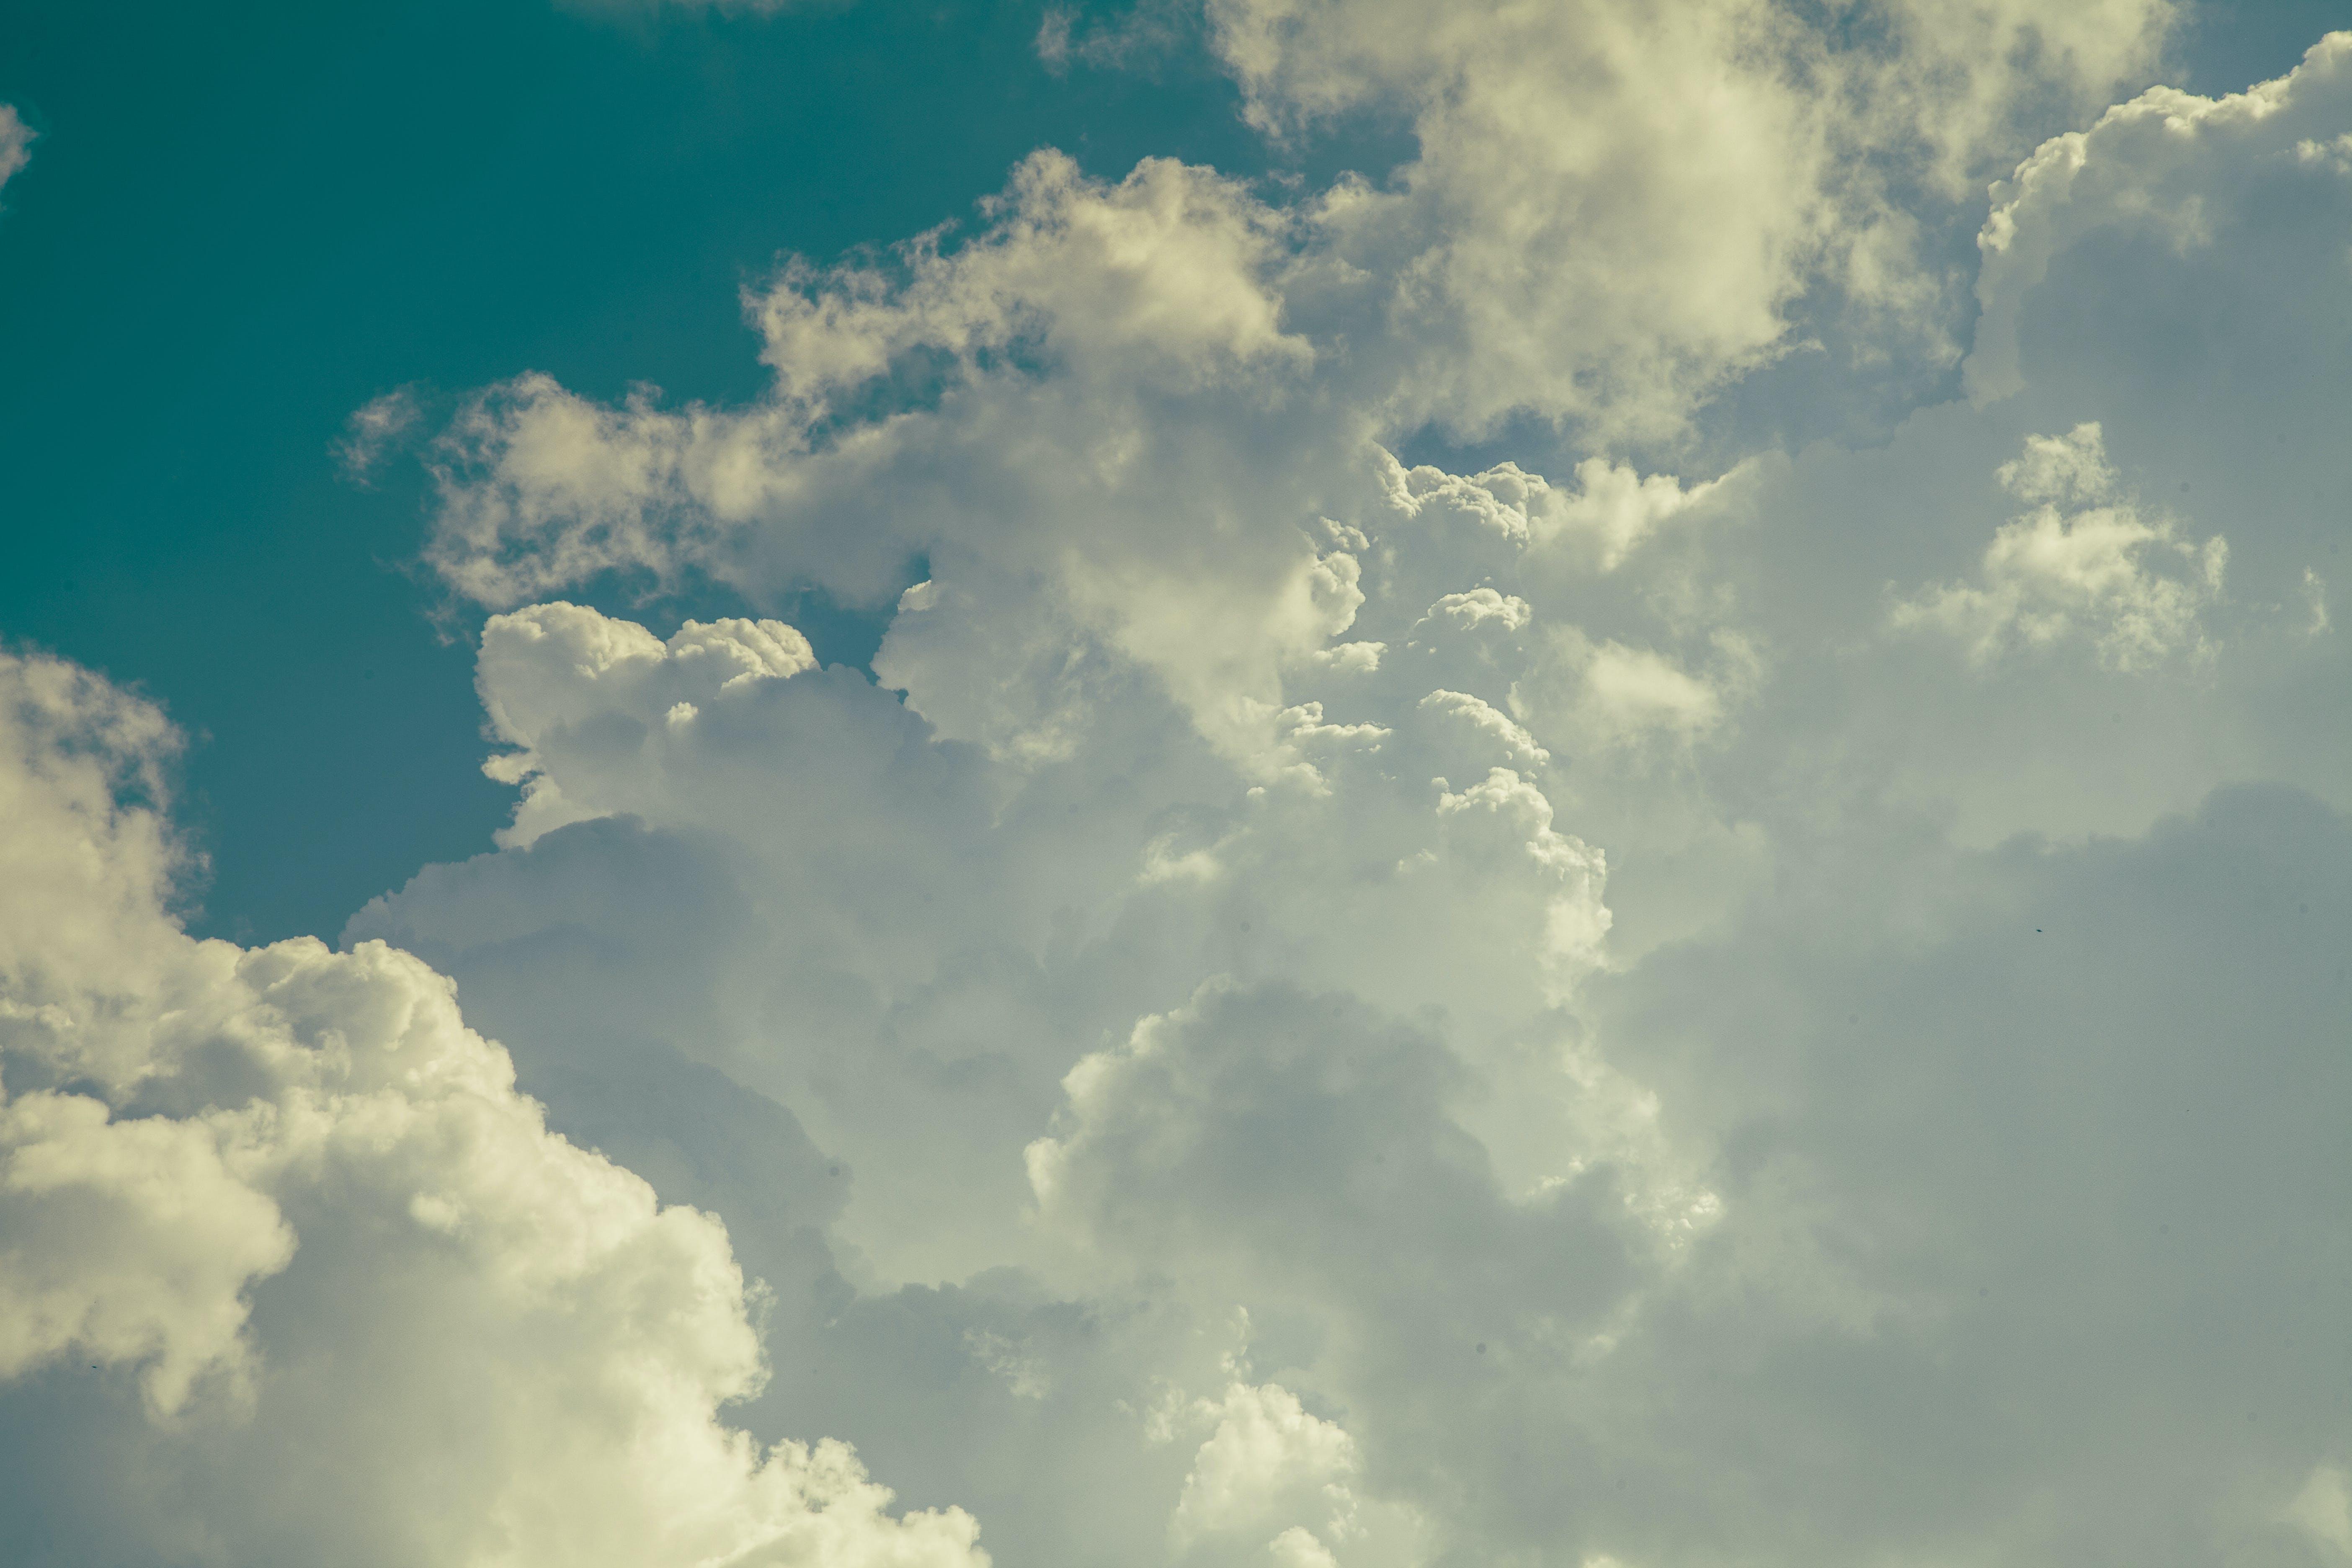 Free stock photo of background, background image, blue, cloud